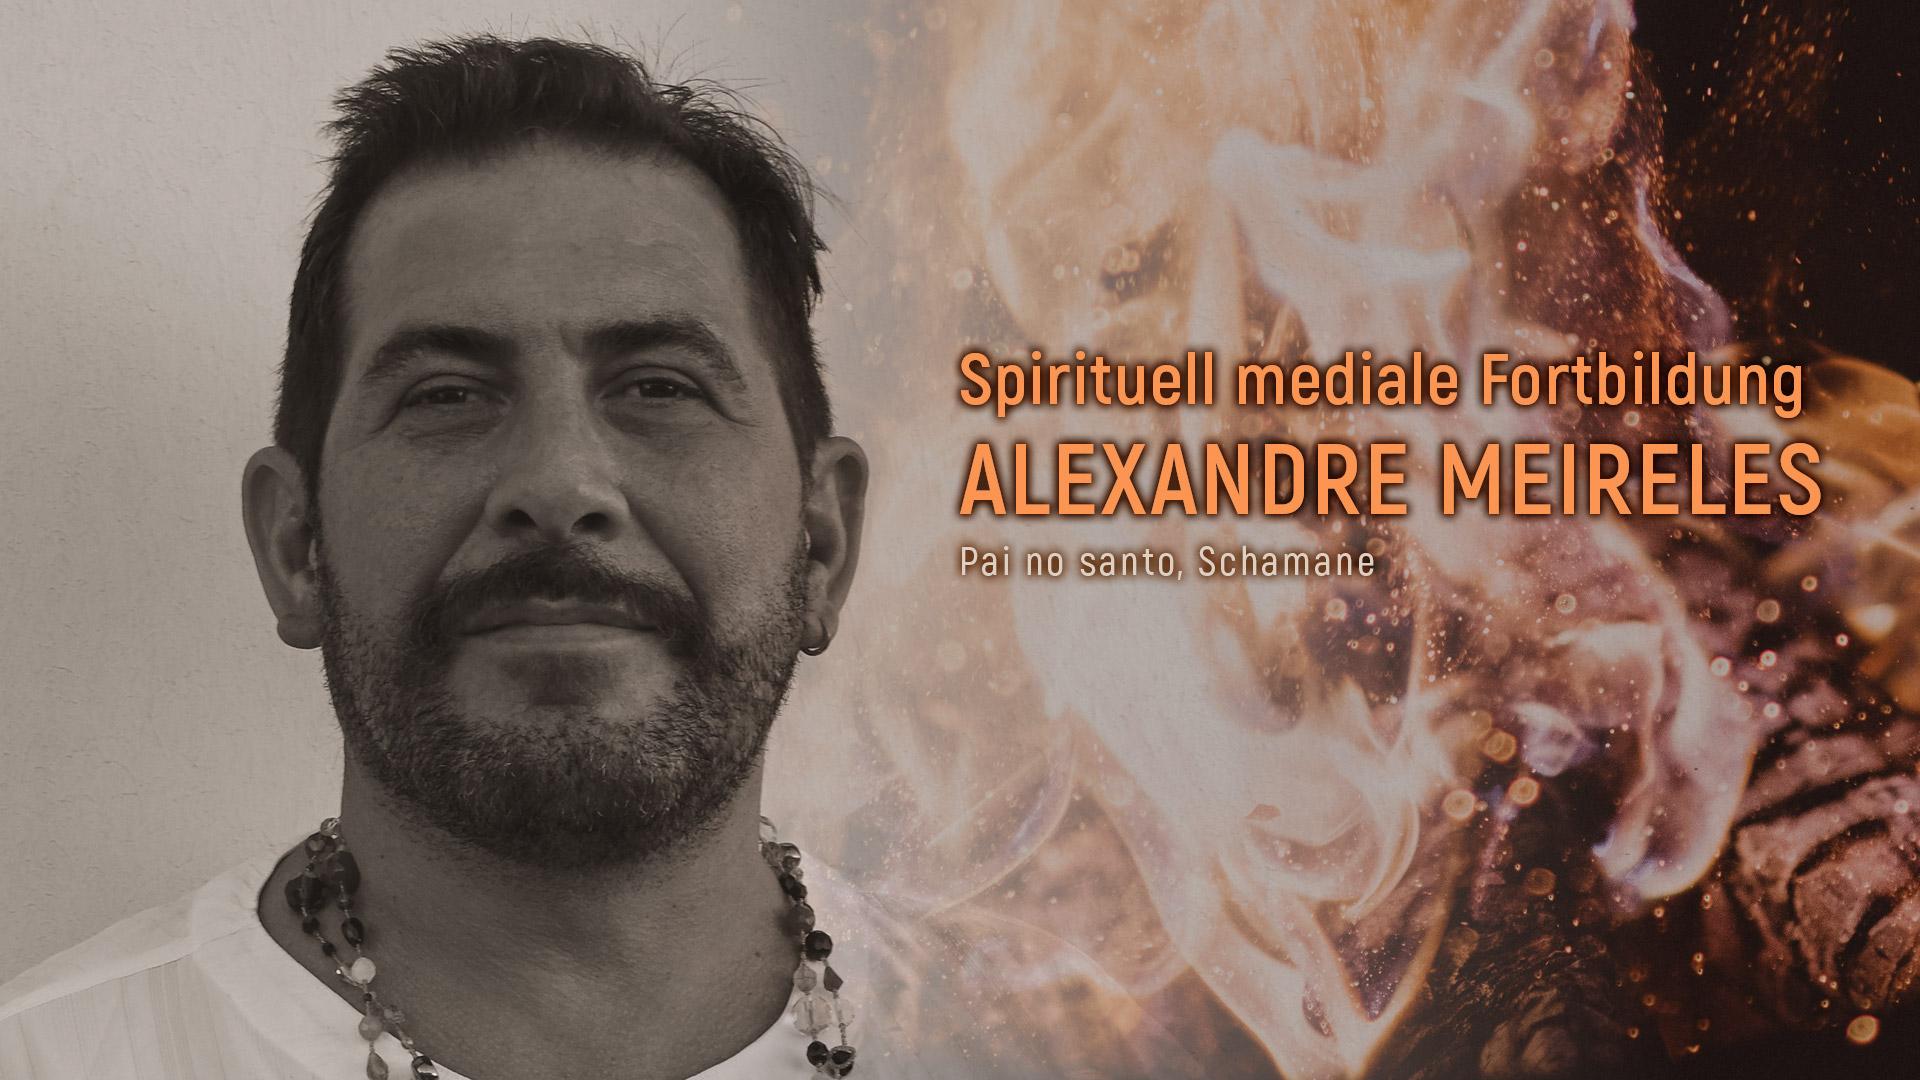 Alexandre Meireles